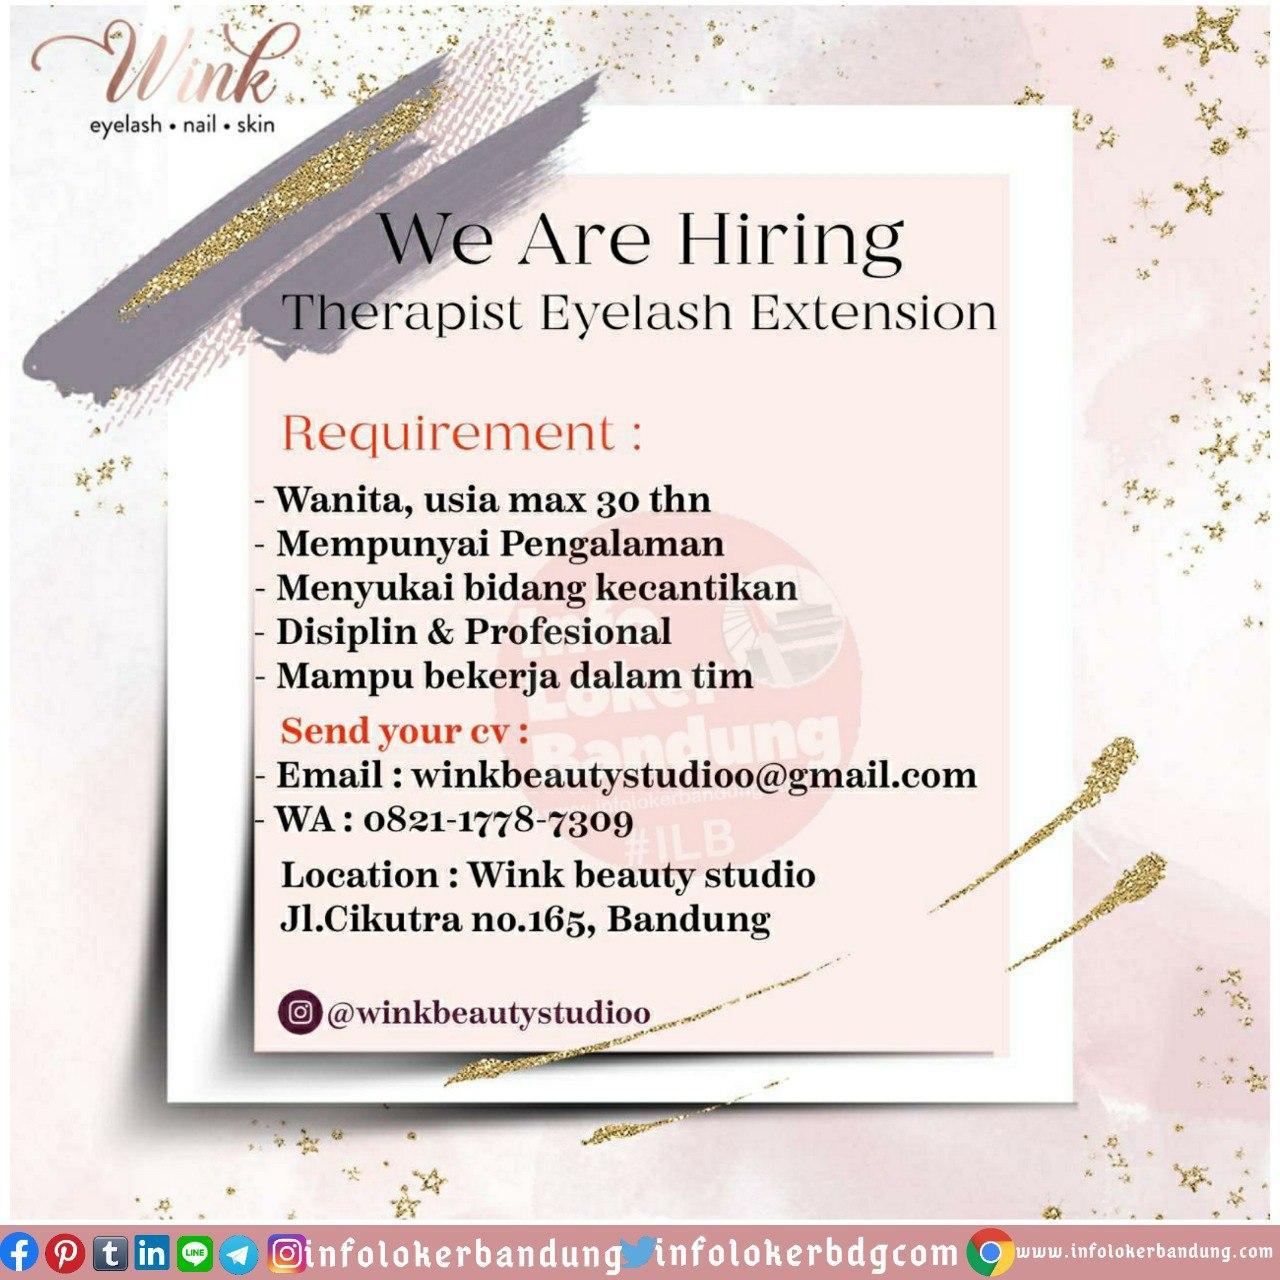 Lowongan Kerja Therapist Eyelash Extension Wink Beauty Studio Bandung Juni 2020